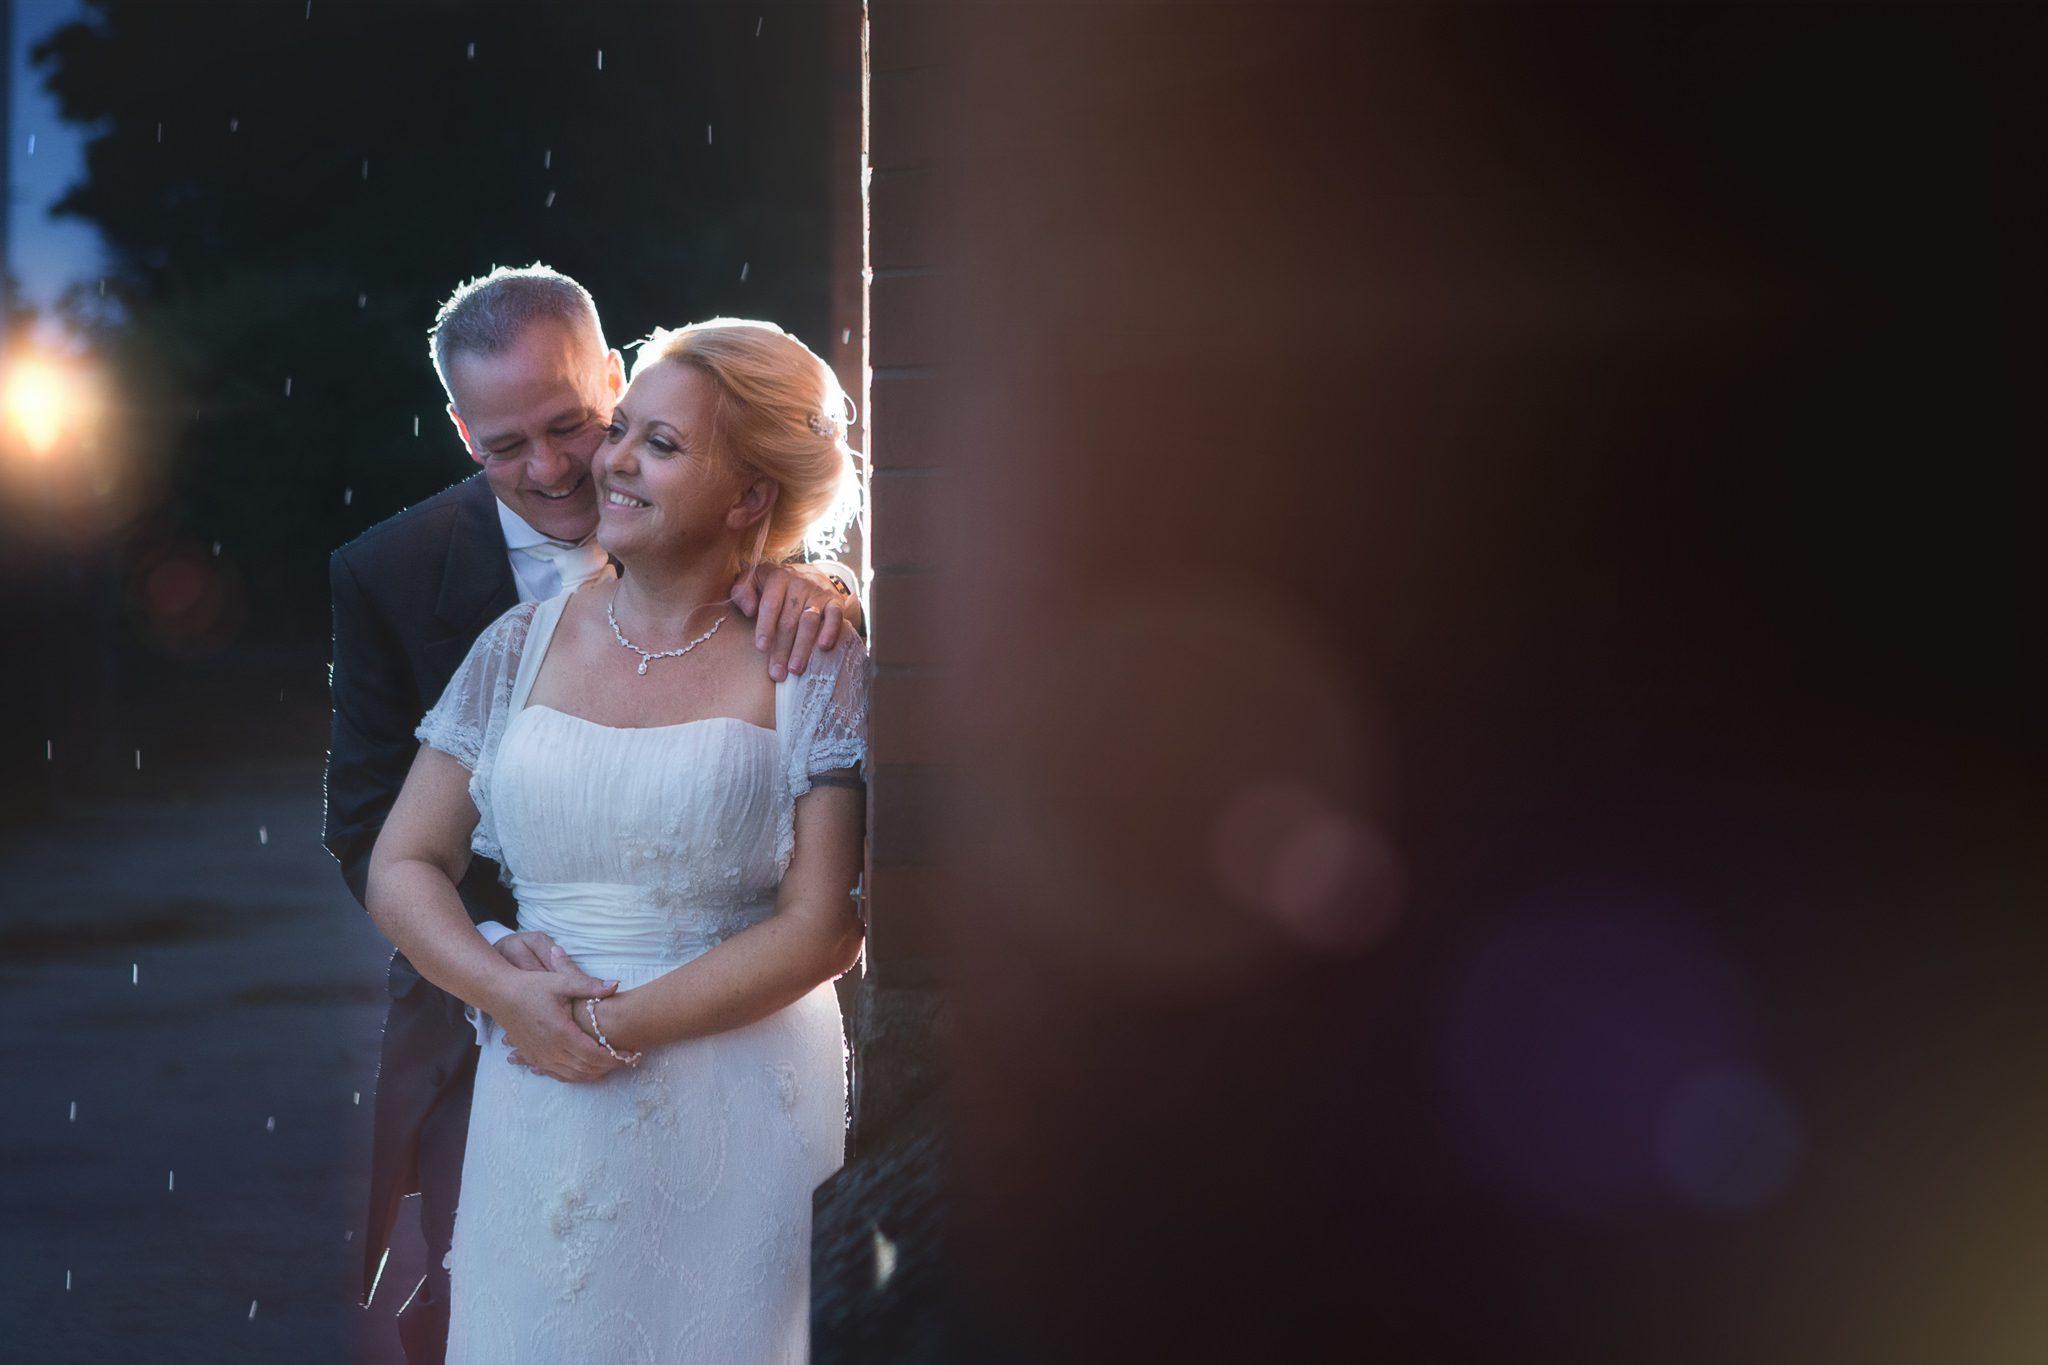 Manchester Wedding Photographer - John and Karen